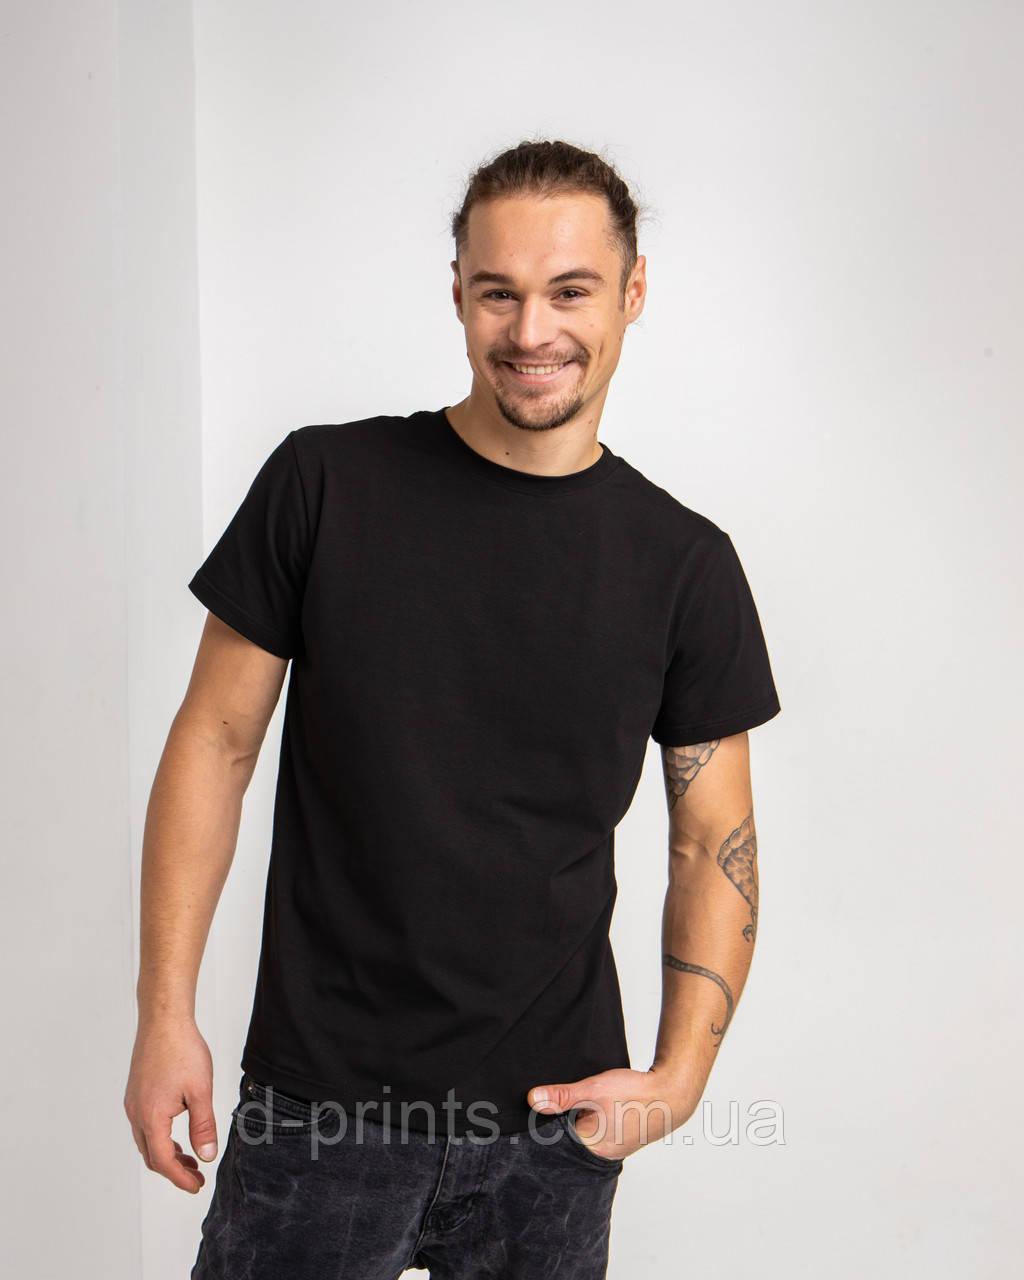 Футболка чоловіча AMULET PENIE 170 Чорна